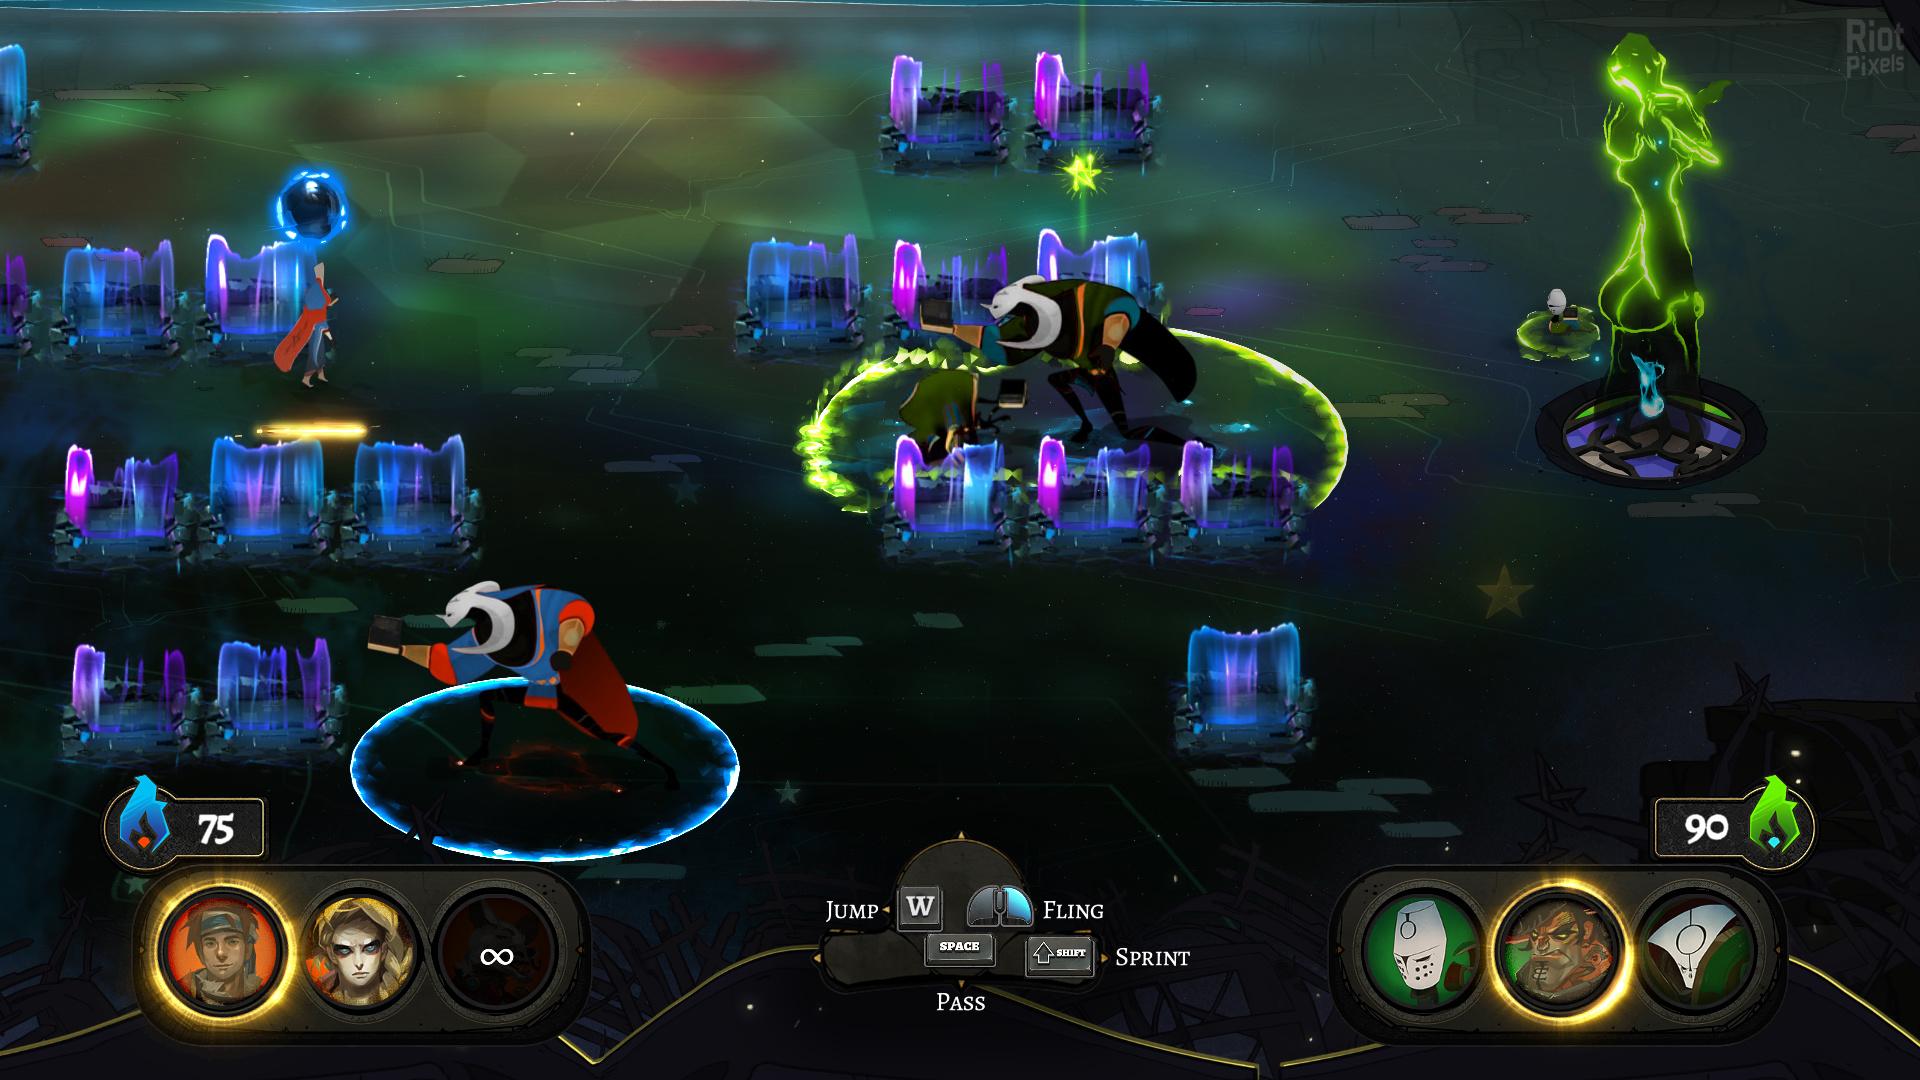 Pyre - game screenshots at Riot Pixels, images